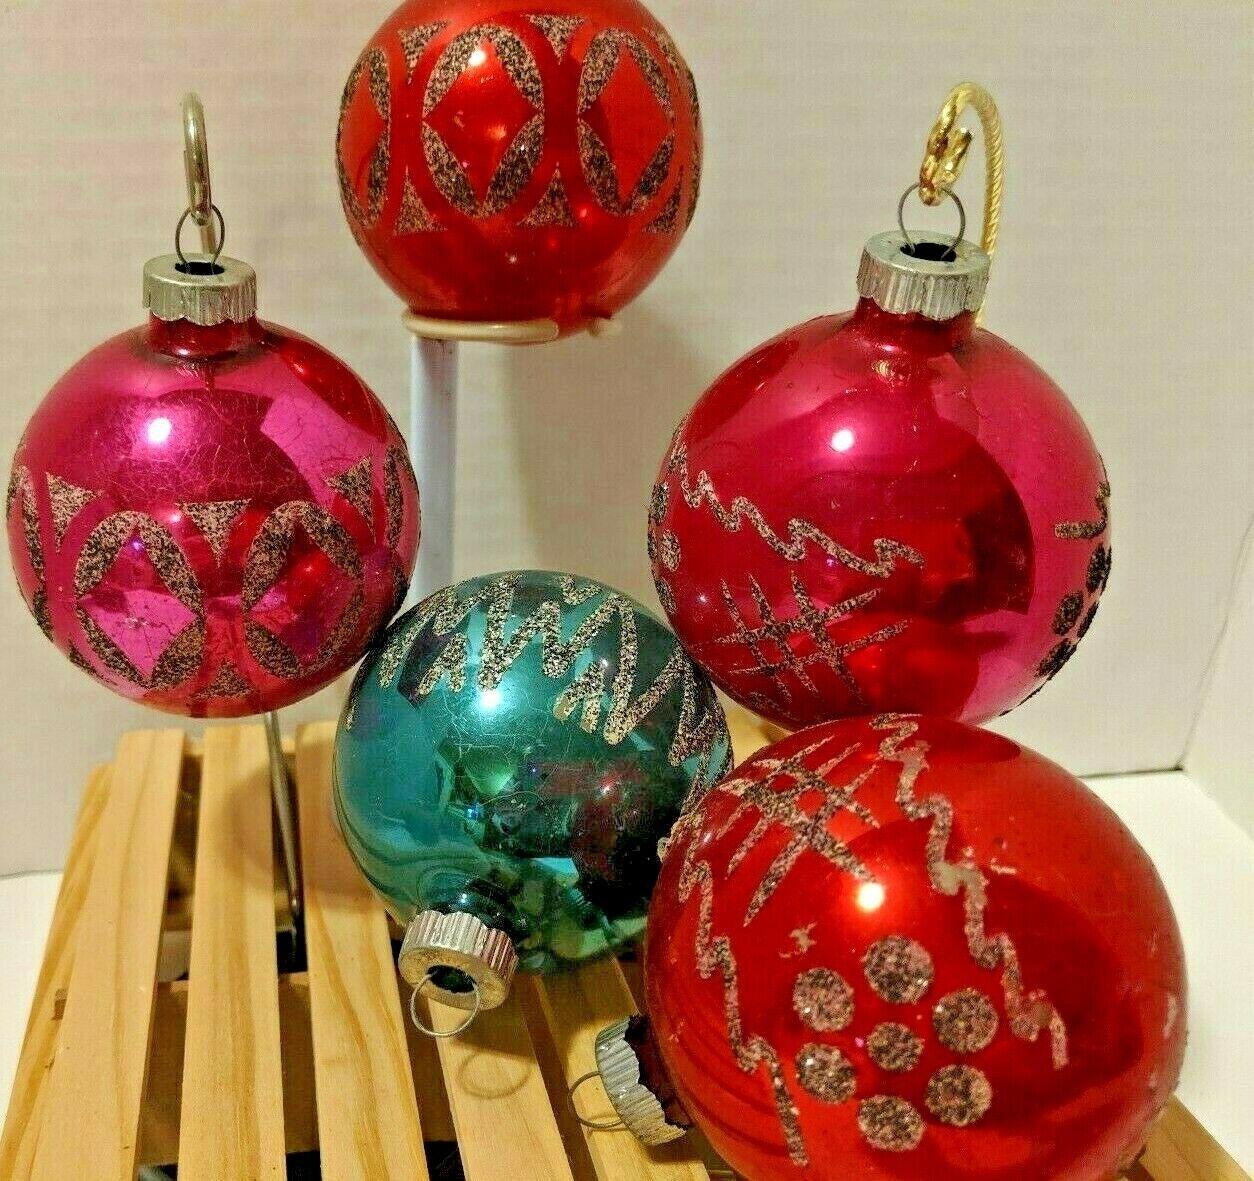 Shiny Brite Stenciled Christmas Ornament Lot By Testedandtried On Etsy Christmas Ornaments Shiny Brite Vintage Ornaments